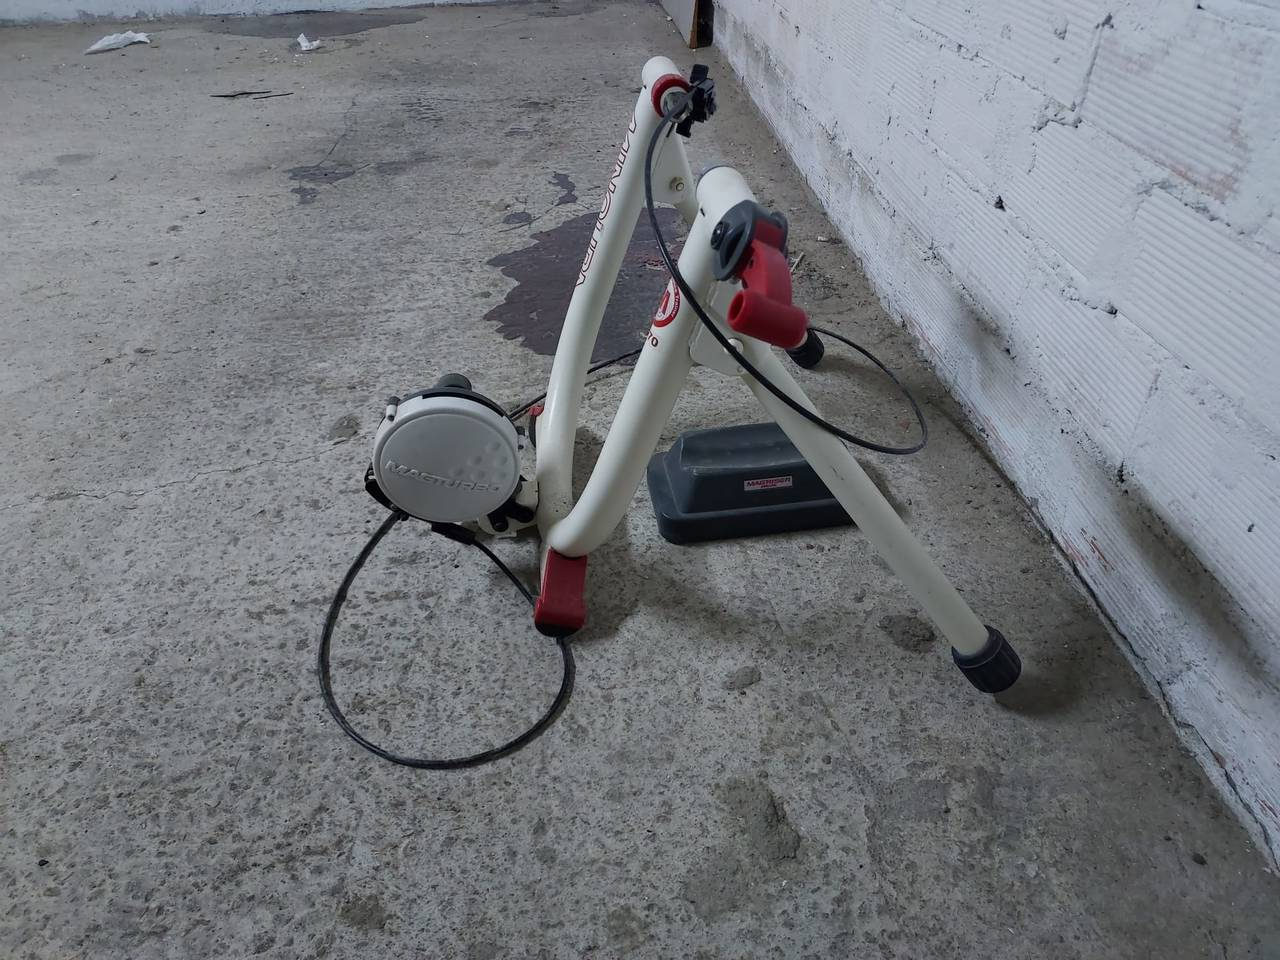 Rodillo de entrenamiento bicicleta.  - Foto 2